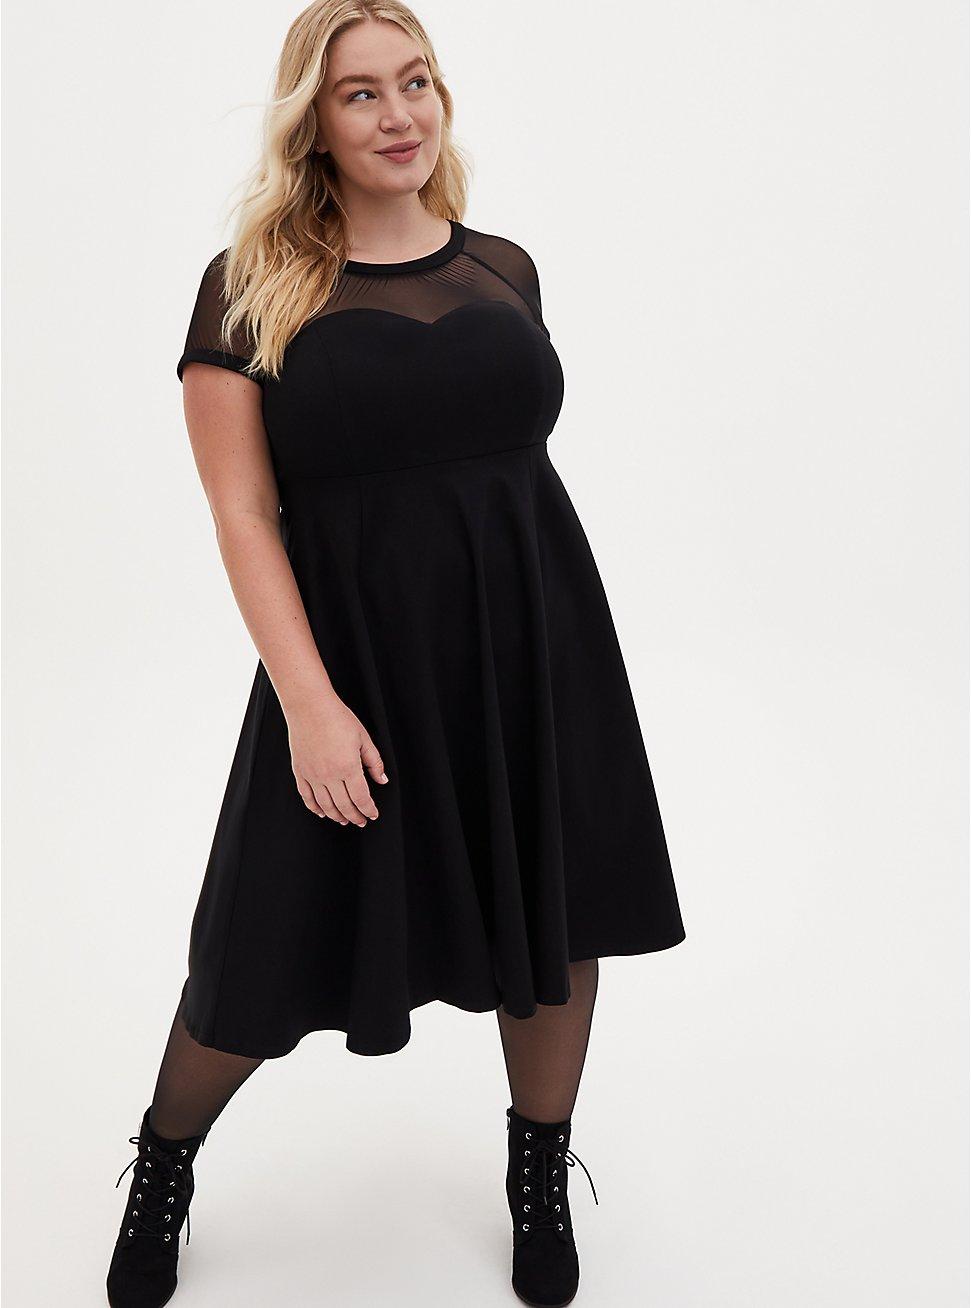 Black Mesh Inset Swing Dress, DEEP BLACK, hi-res